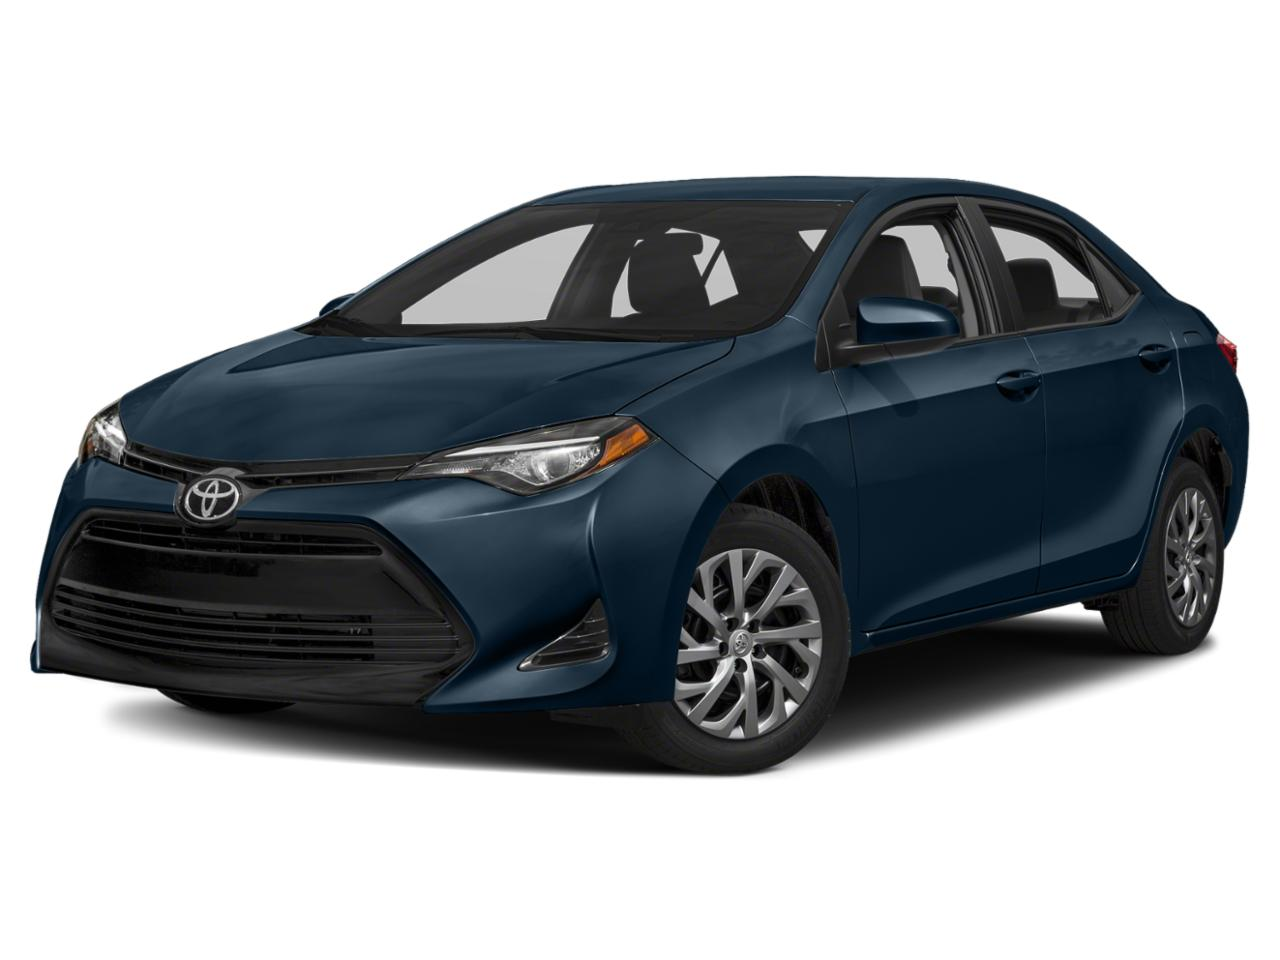 2019 Toyota Corolla Vehicle Photo in Gainesville, FL 32609